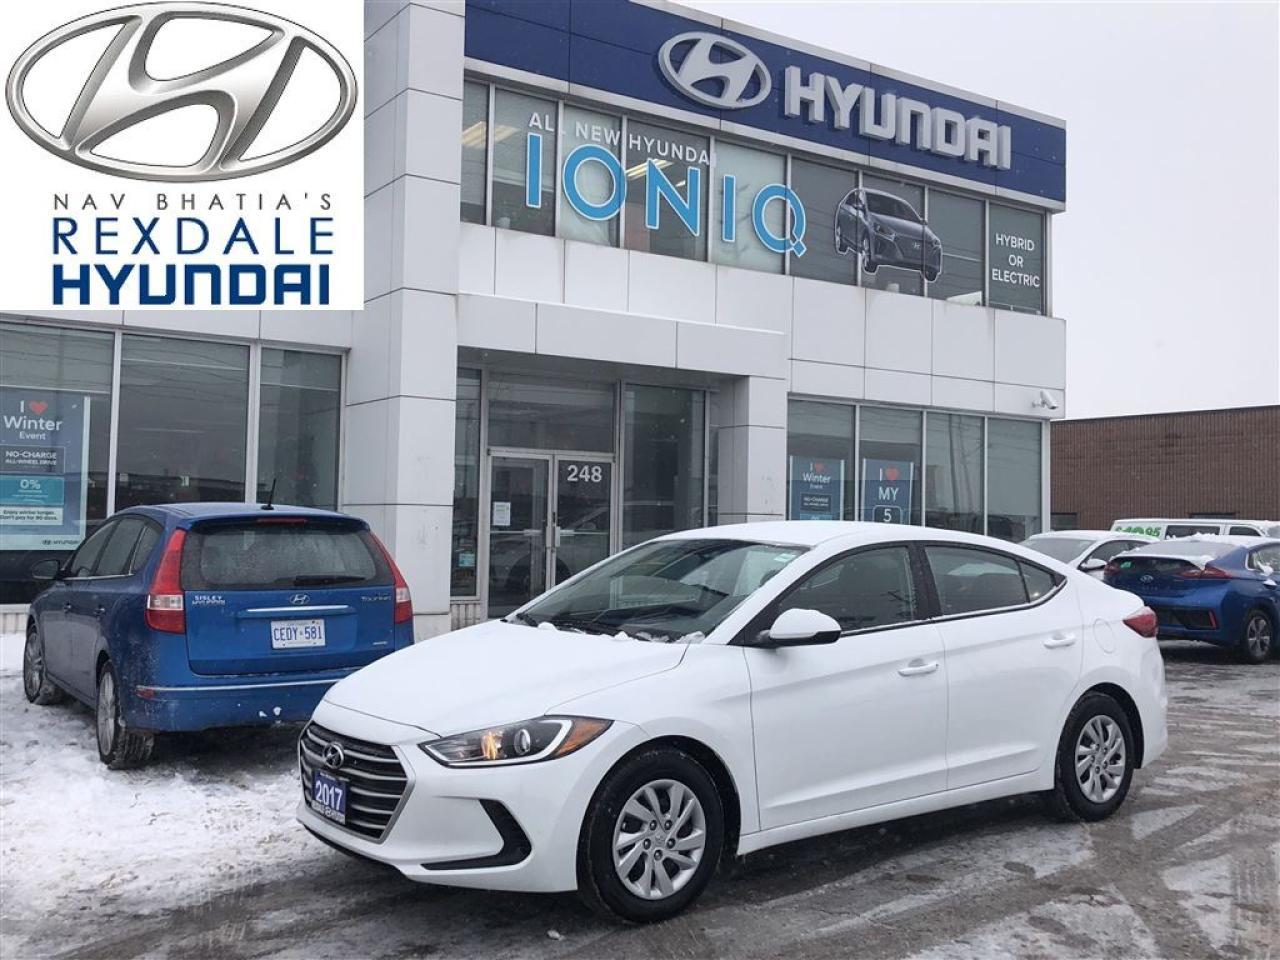 2017 Hyundai Elantra LE- AUTO, A/C, PWLM & KEYLESS ENTRY